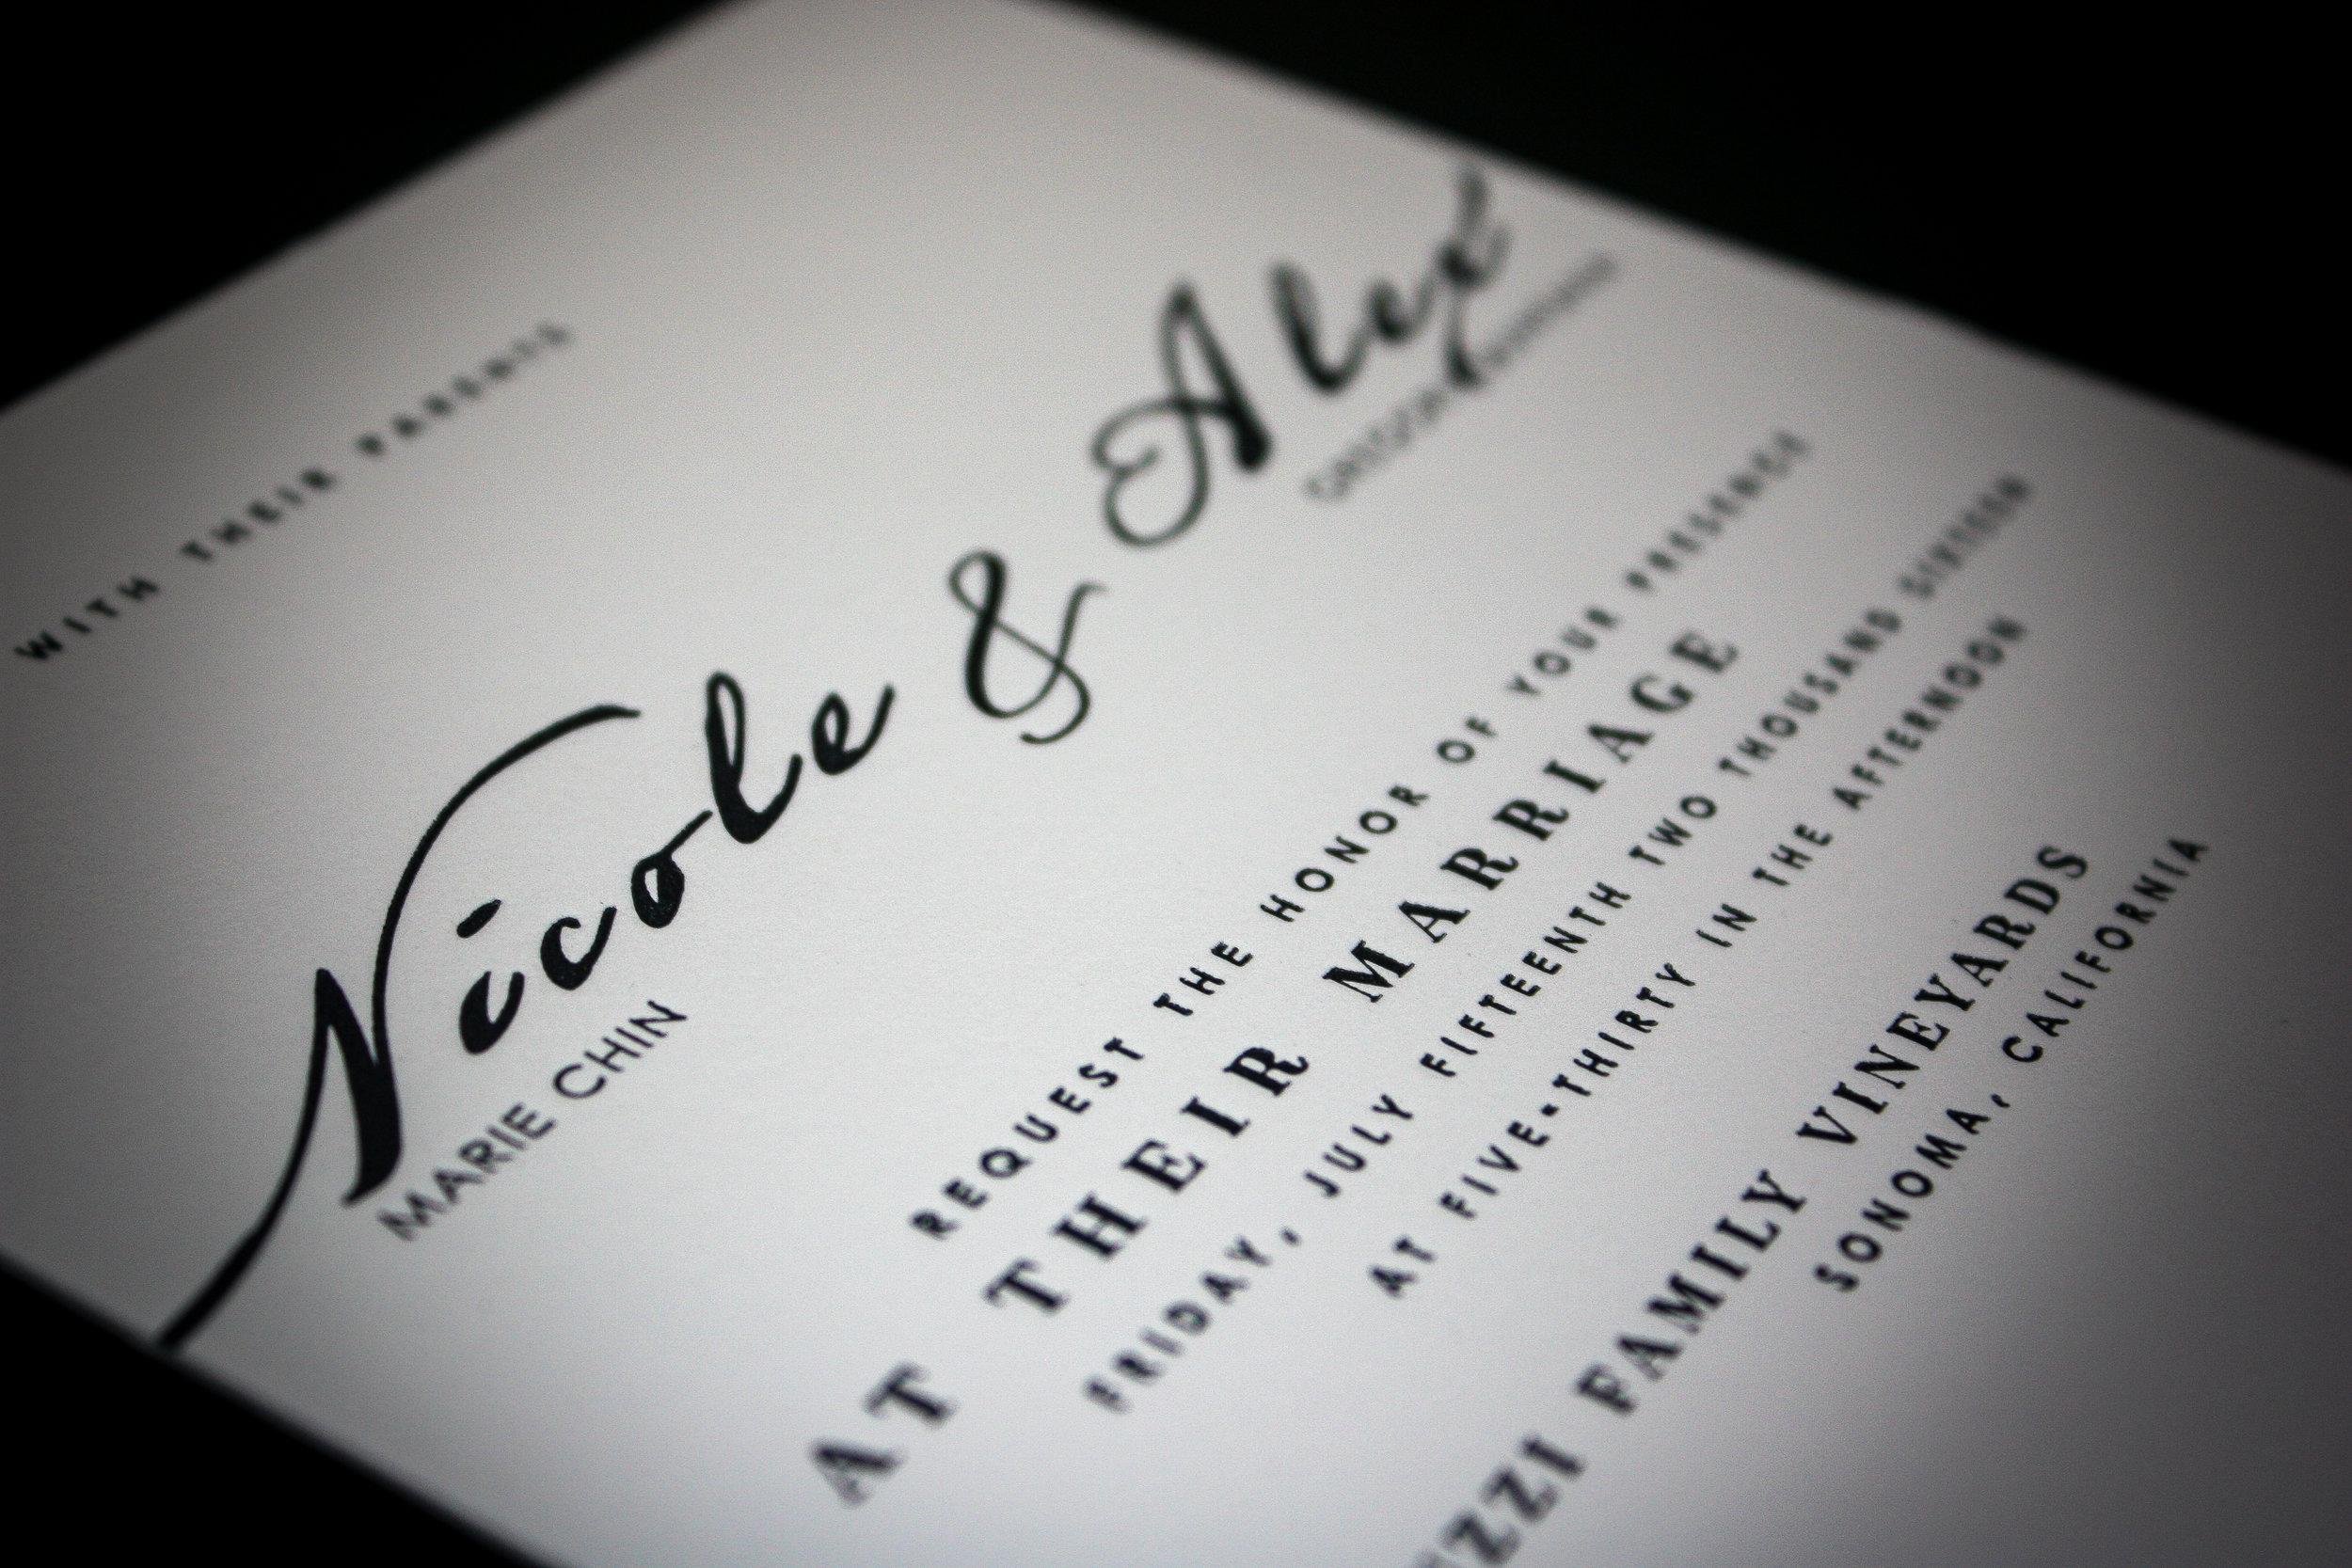 Wedding Invite Client:  Dreammaker Designs  Letterpress printed wedding invitations.